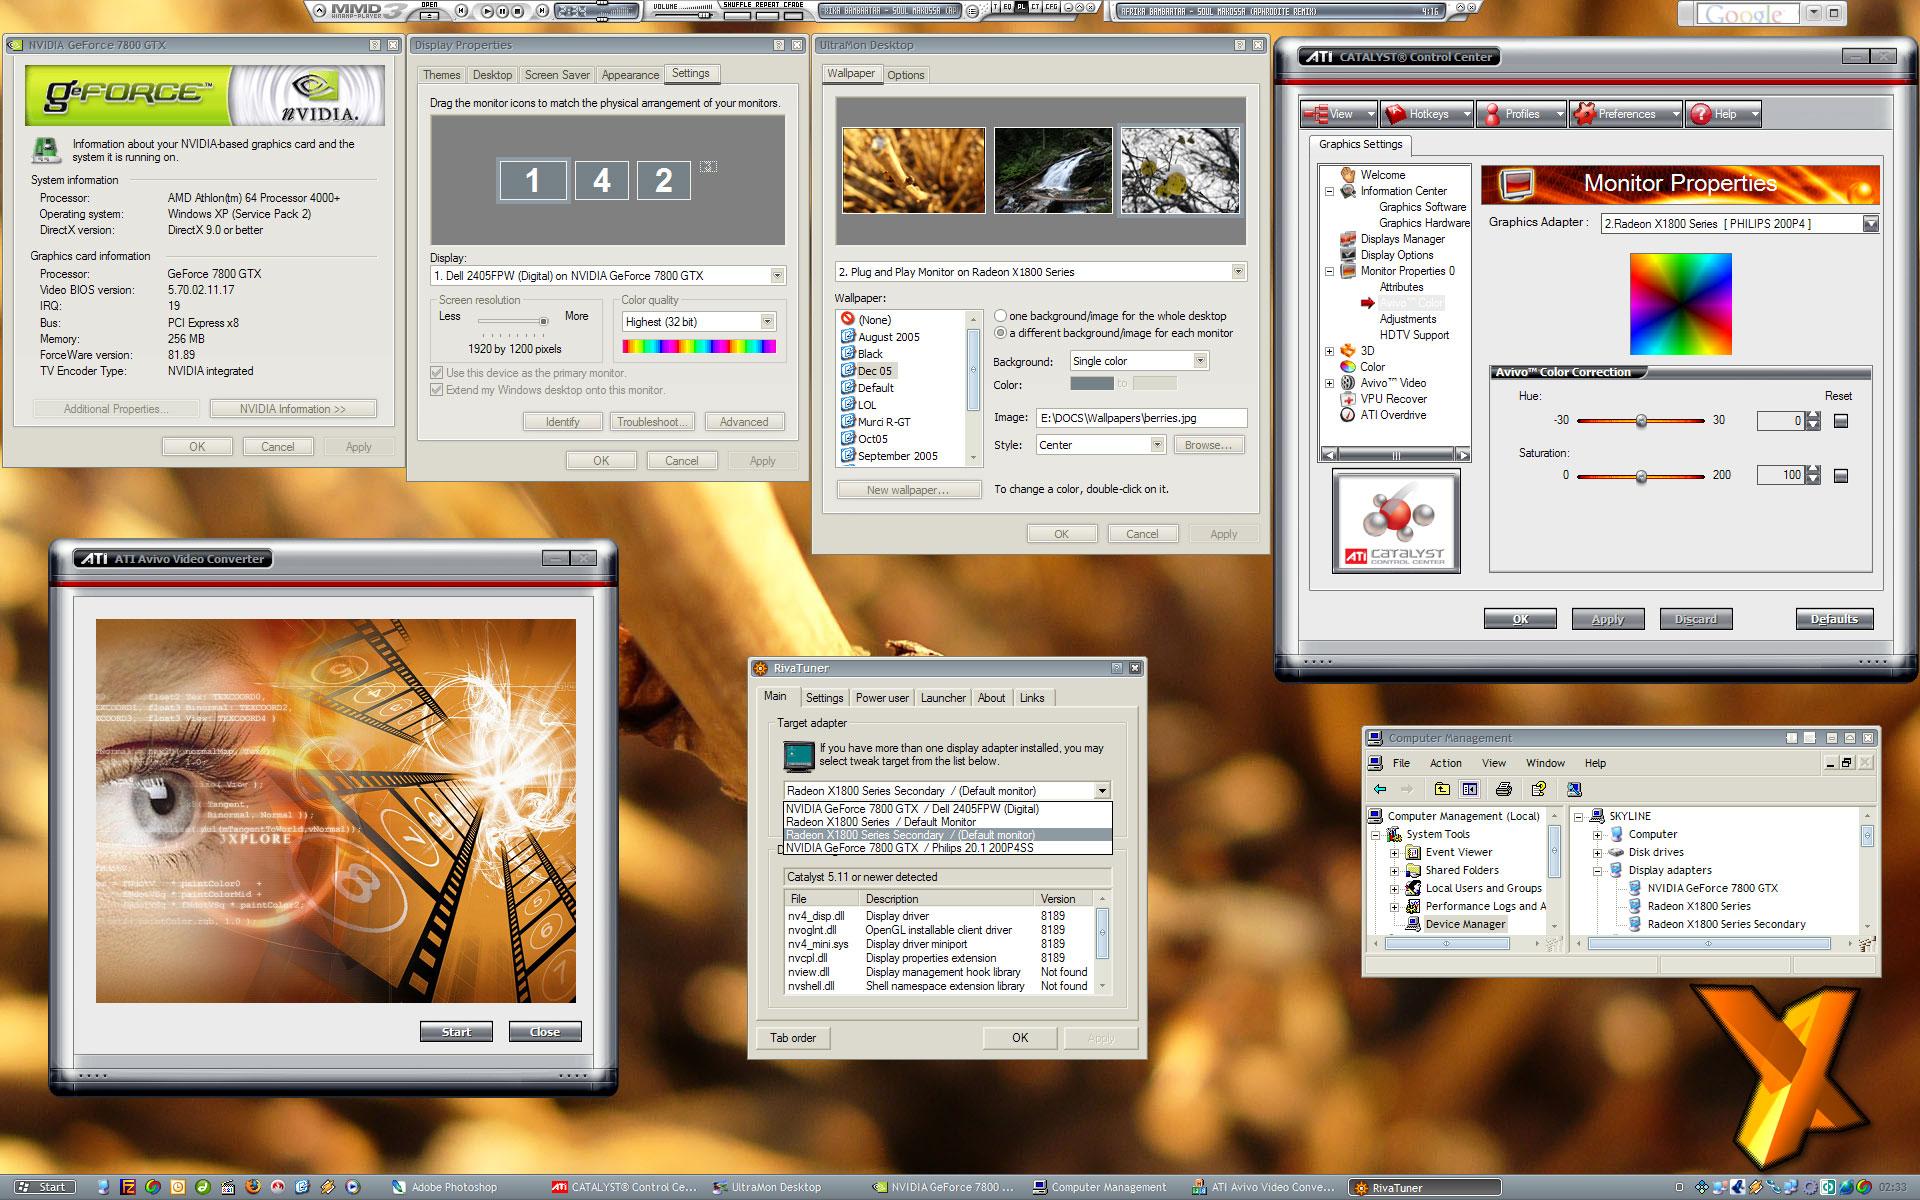 ... top row then bottom: NVIDIA display driver main property sheet, Windows Display Properties Settings, Ultramon monitor wallpaper chooser, ATI CATALYST ...